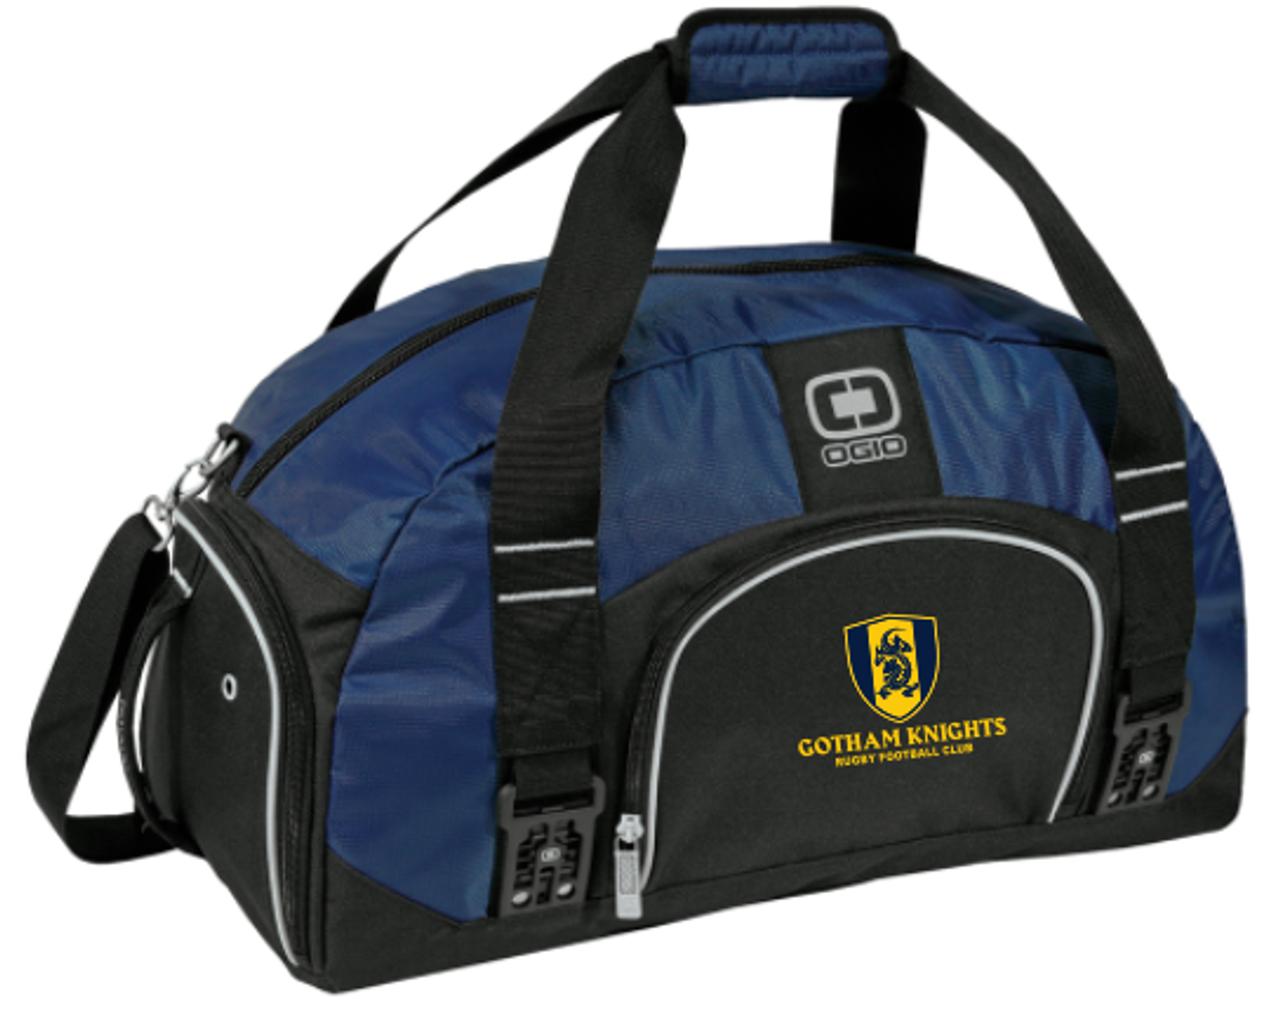 Gotham Knights Midsize Duffel Bag